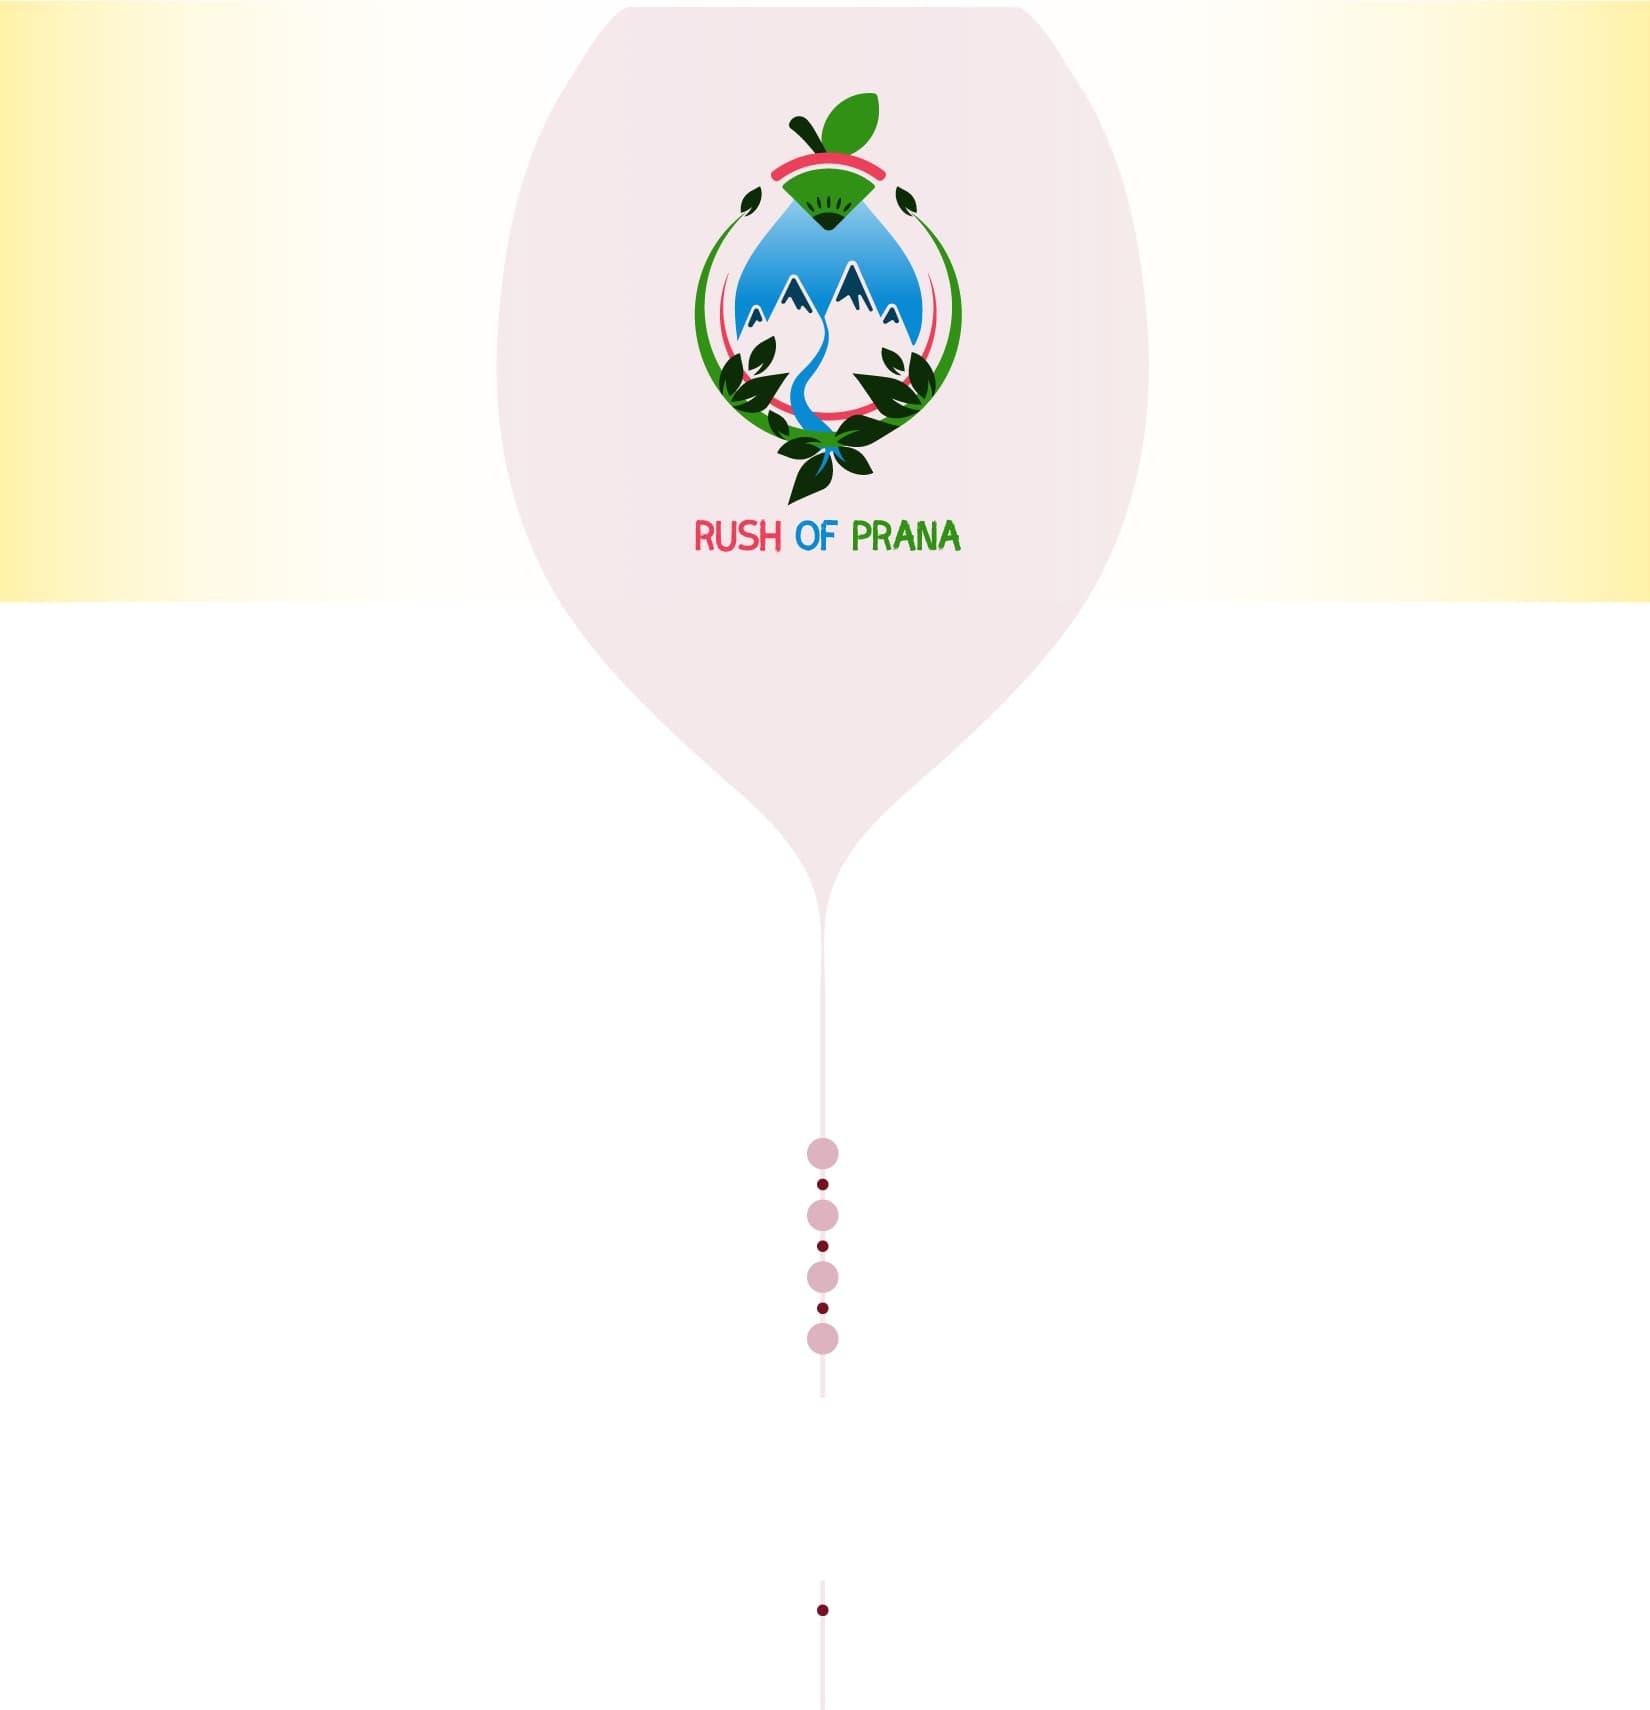 background with Rush of Prana logo